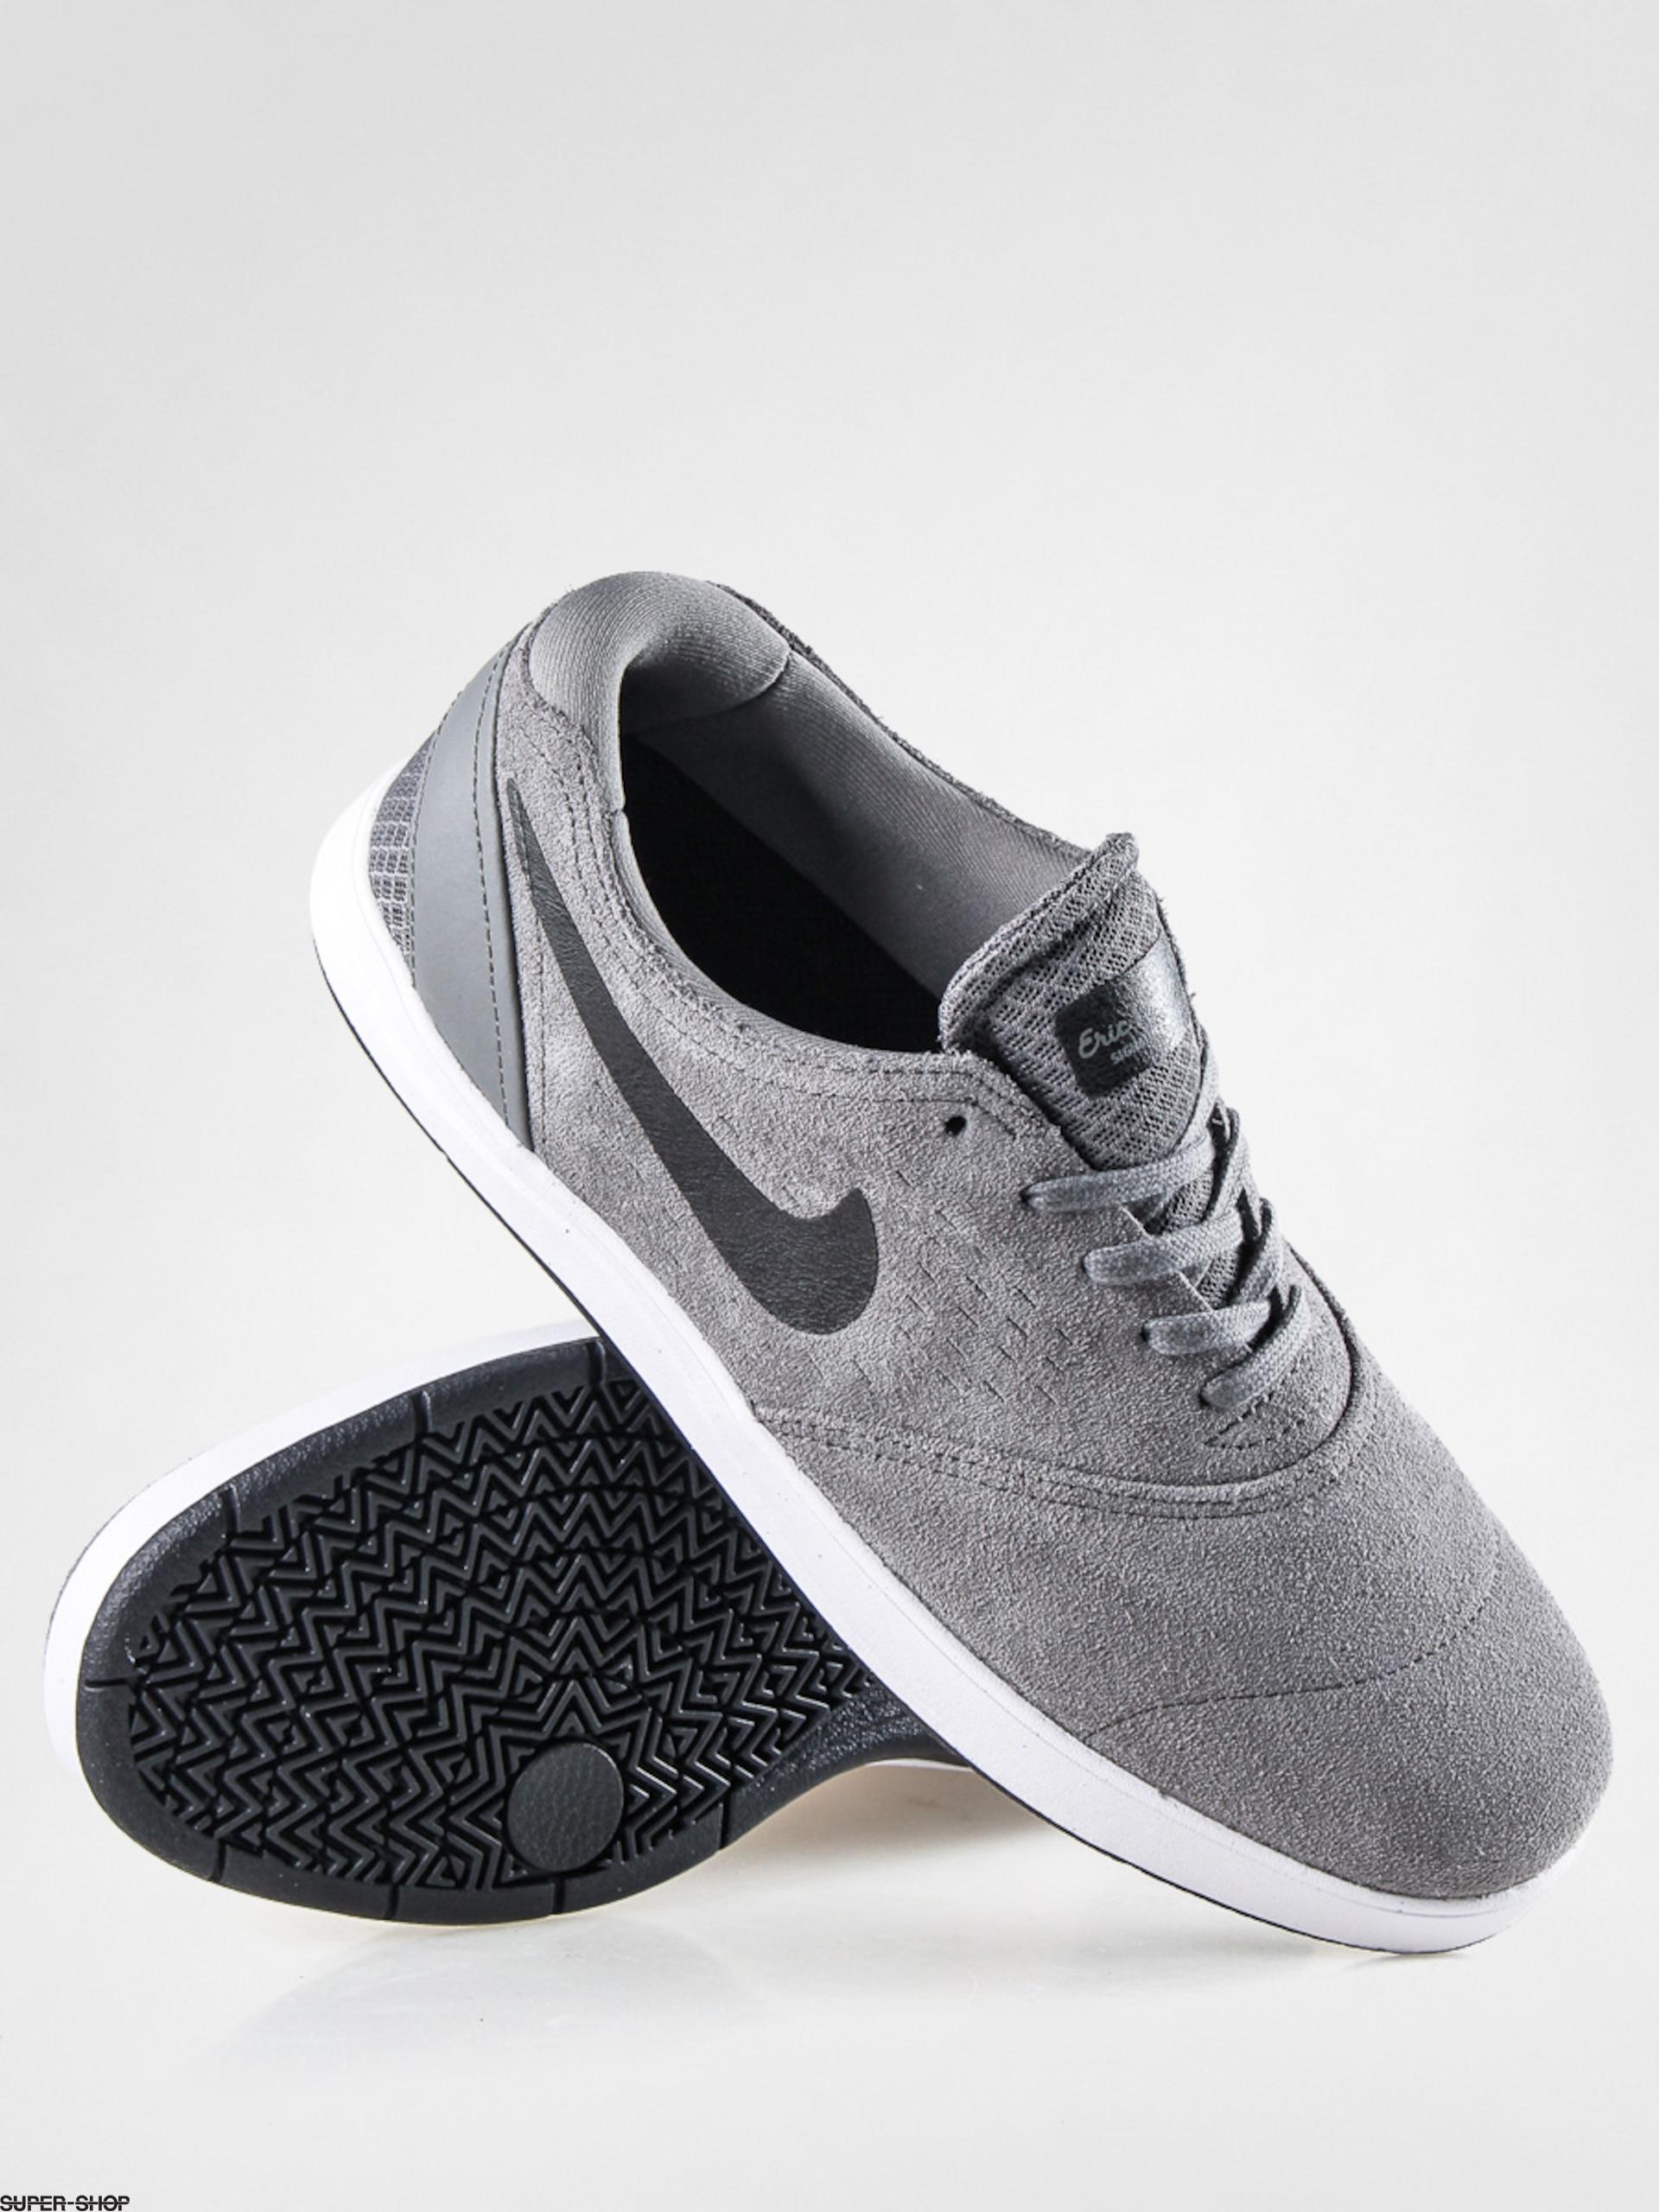 b9b8b1299a5a Nike SB Shoes Eric Koston 2 (med base grey )